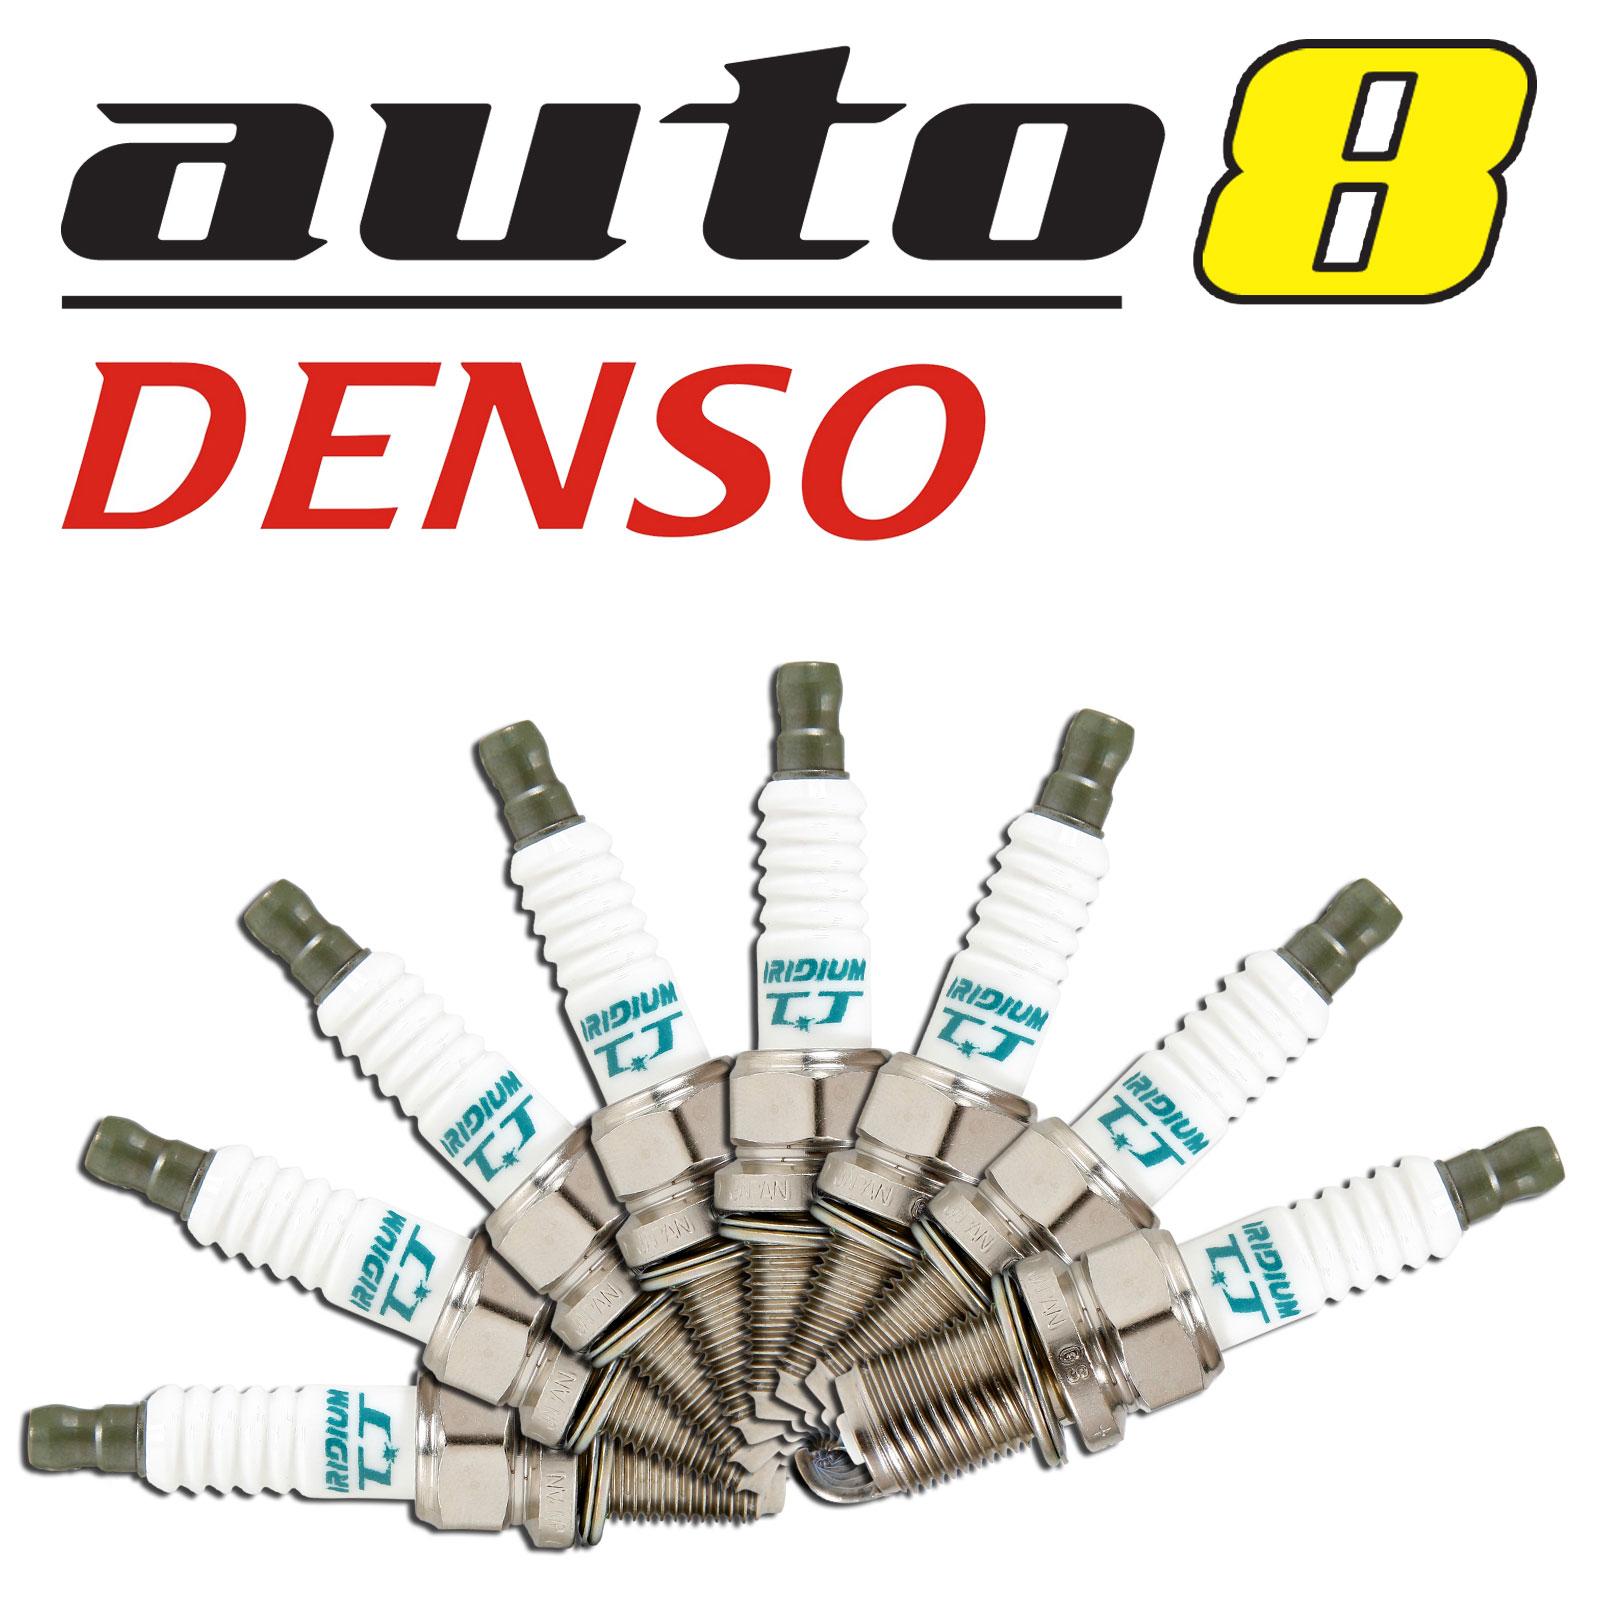 8 x Denso IK16TT Iridium TT Spark Plugs for Toyota Landcruiser 4.7L 2UZ-FE